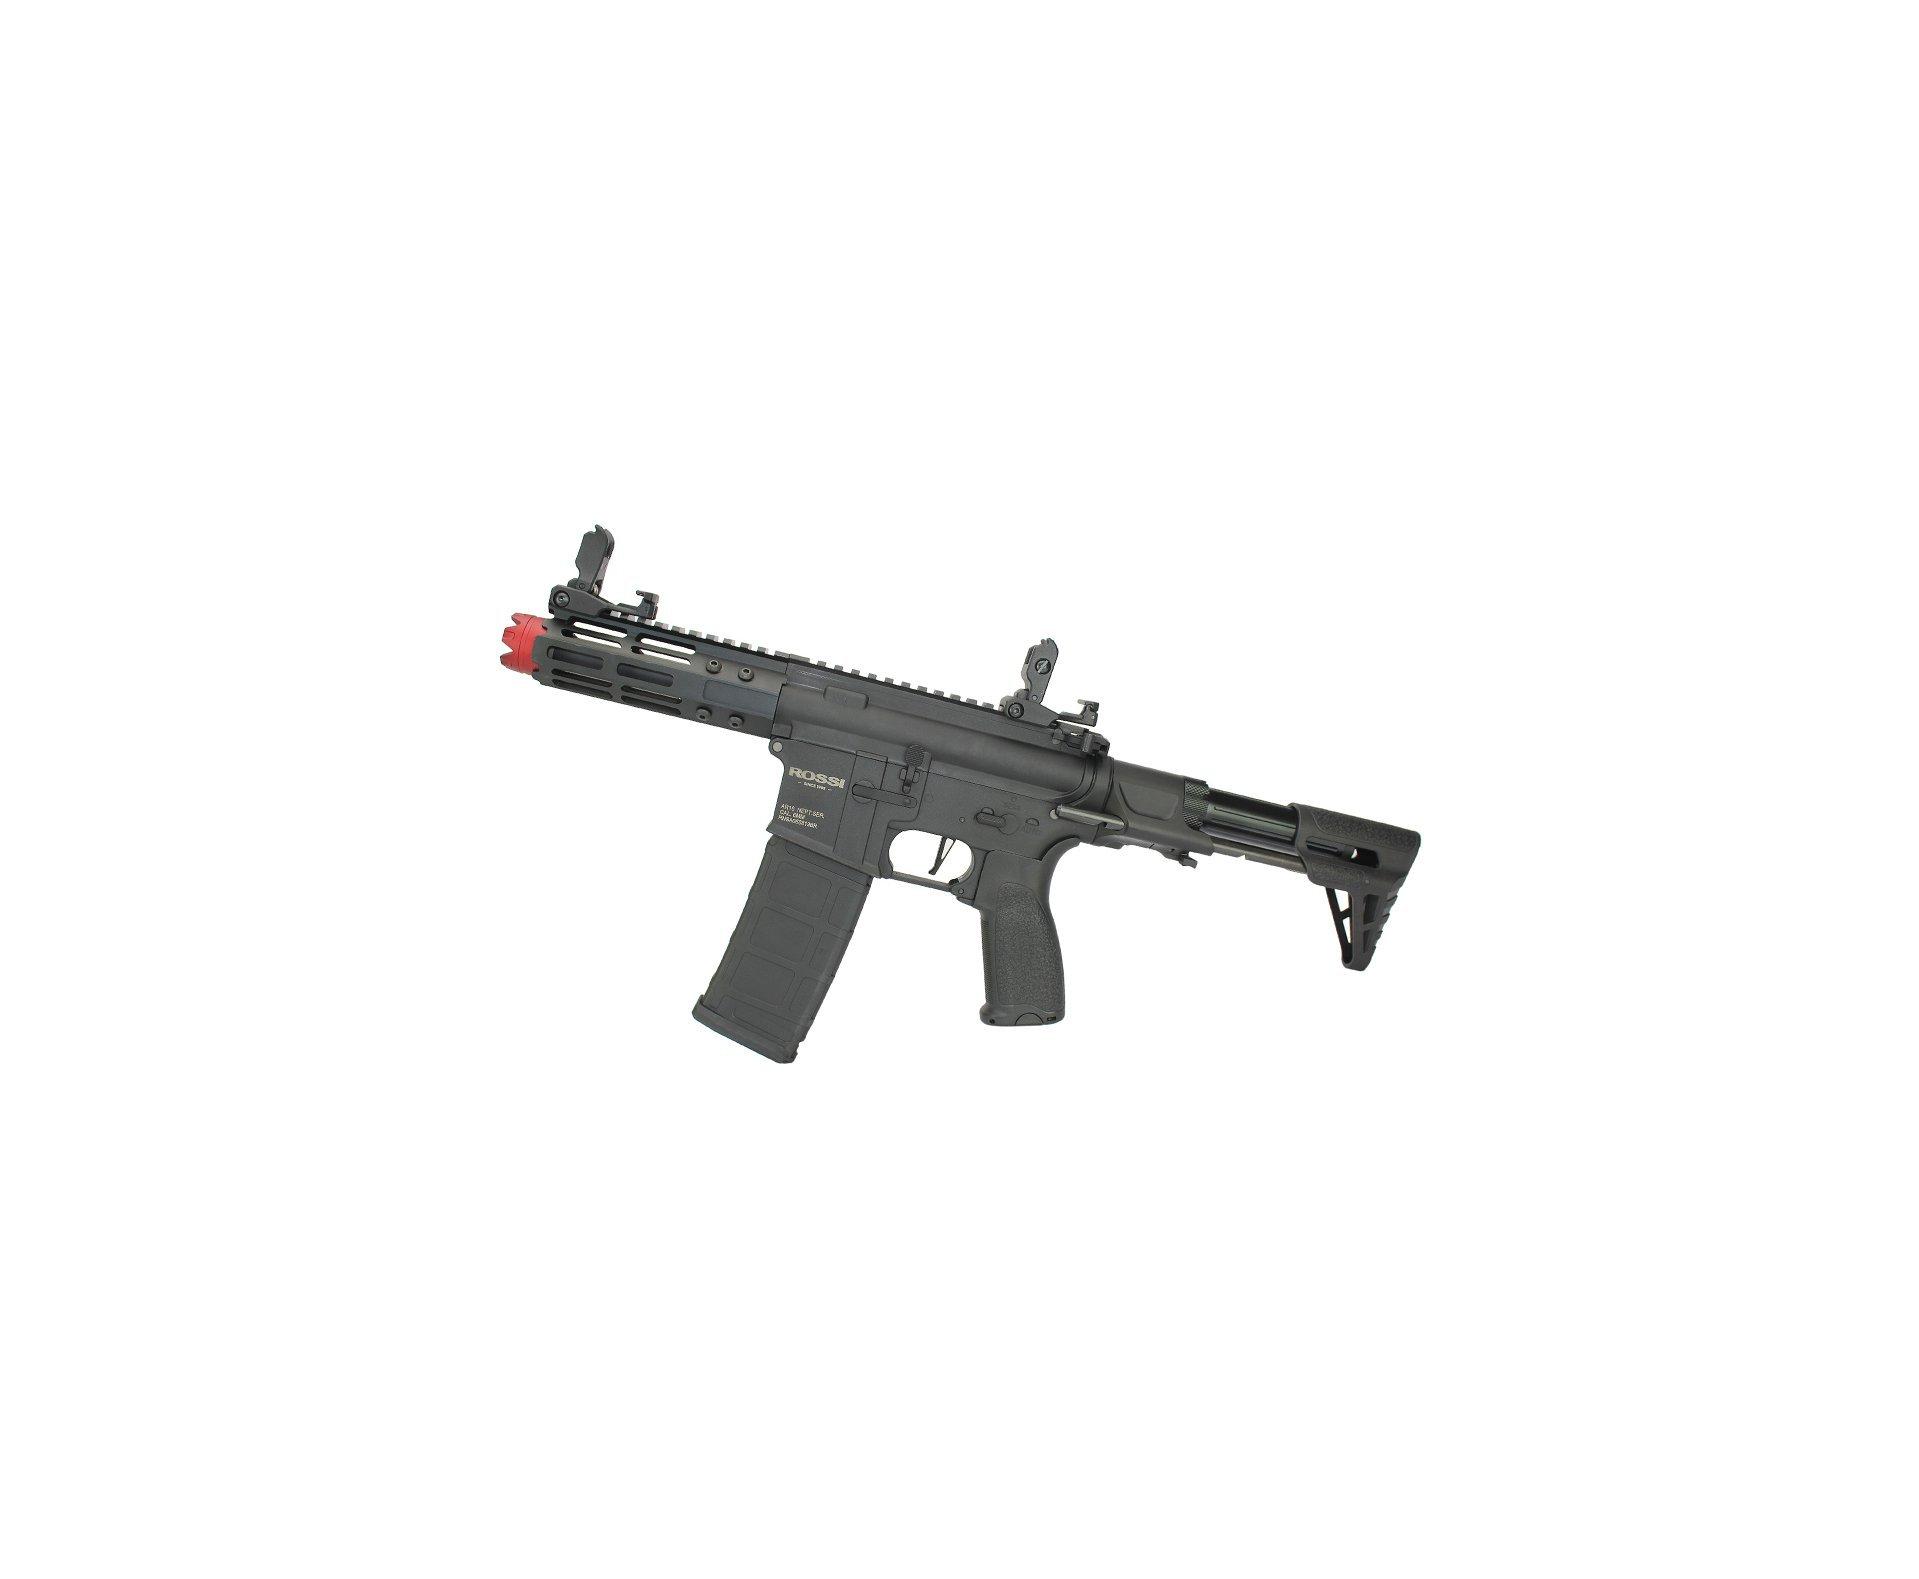 "Rifle De Airsoft Pdw Rossi Ar15 Neptune 6mm Keymod 5,5"" Com Gatilho Et + Capa Case Mdc + Esfera Plastica 0,20g 4000uni"